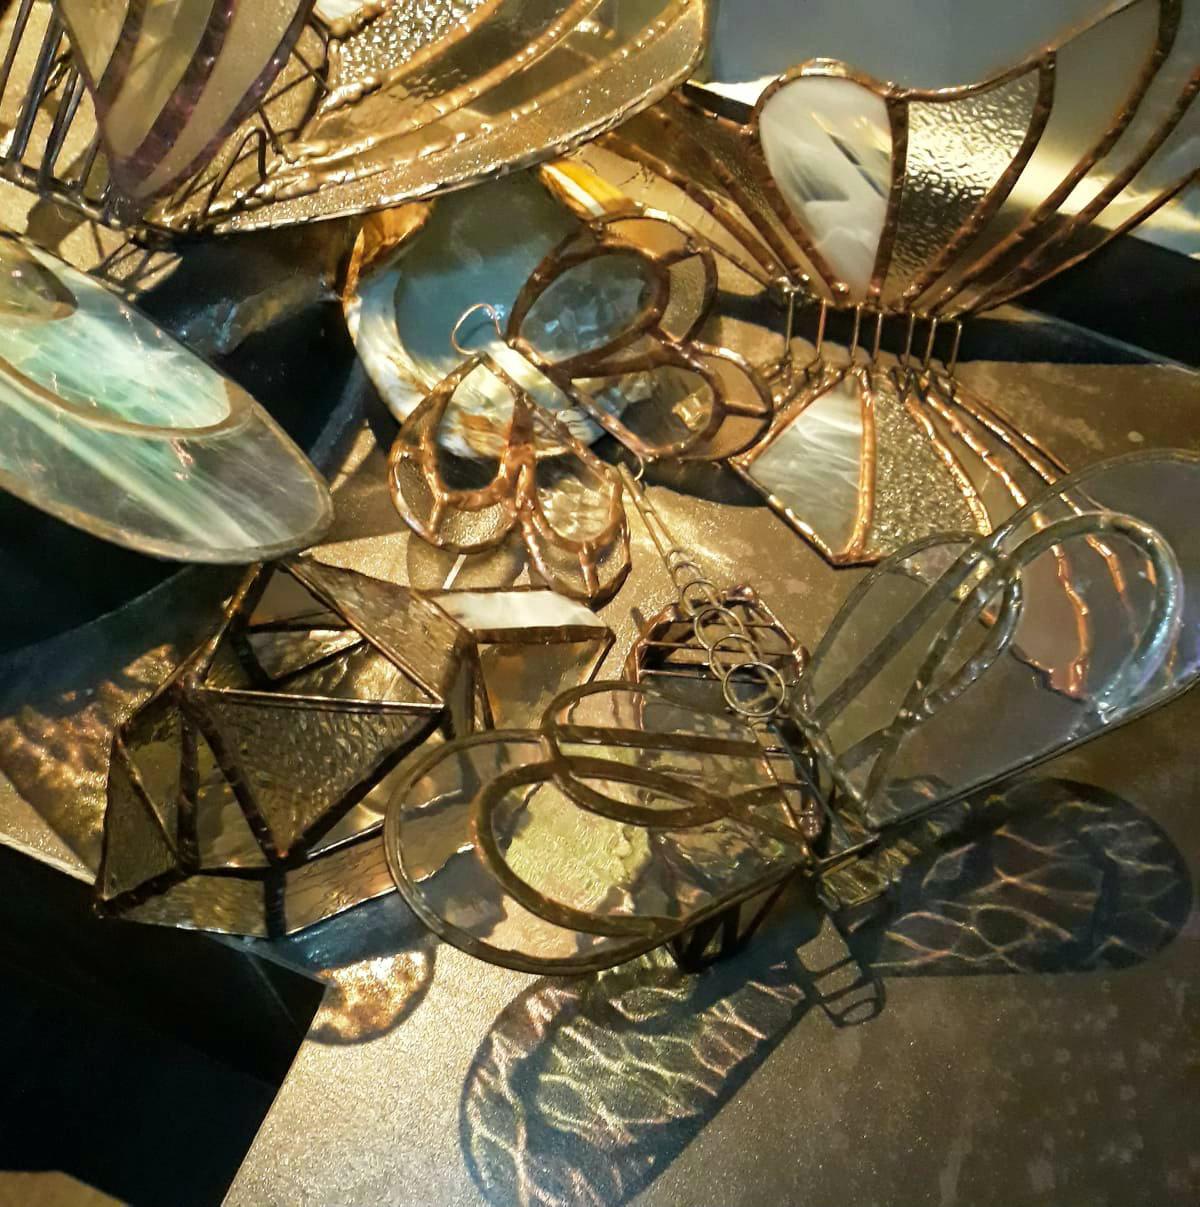 Oι γυάλινες πεταλούδες της Μαίρης